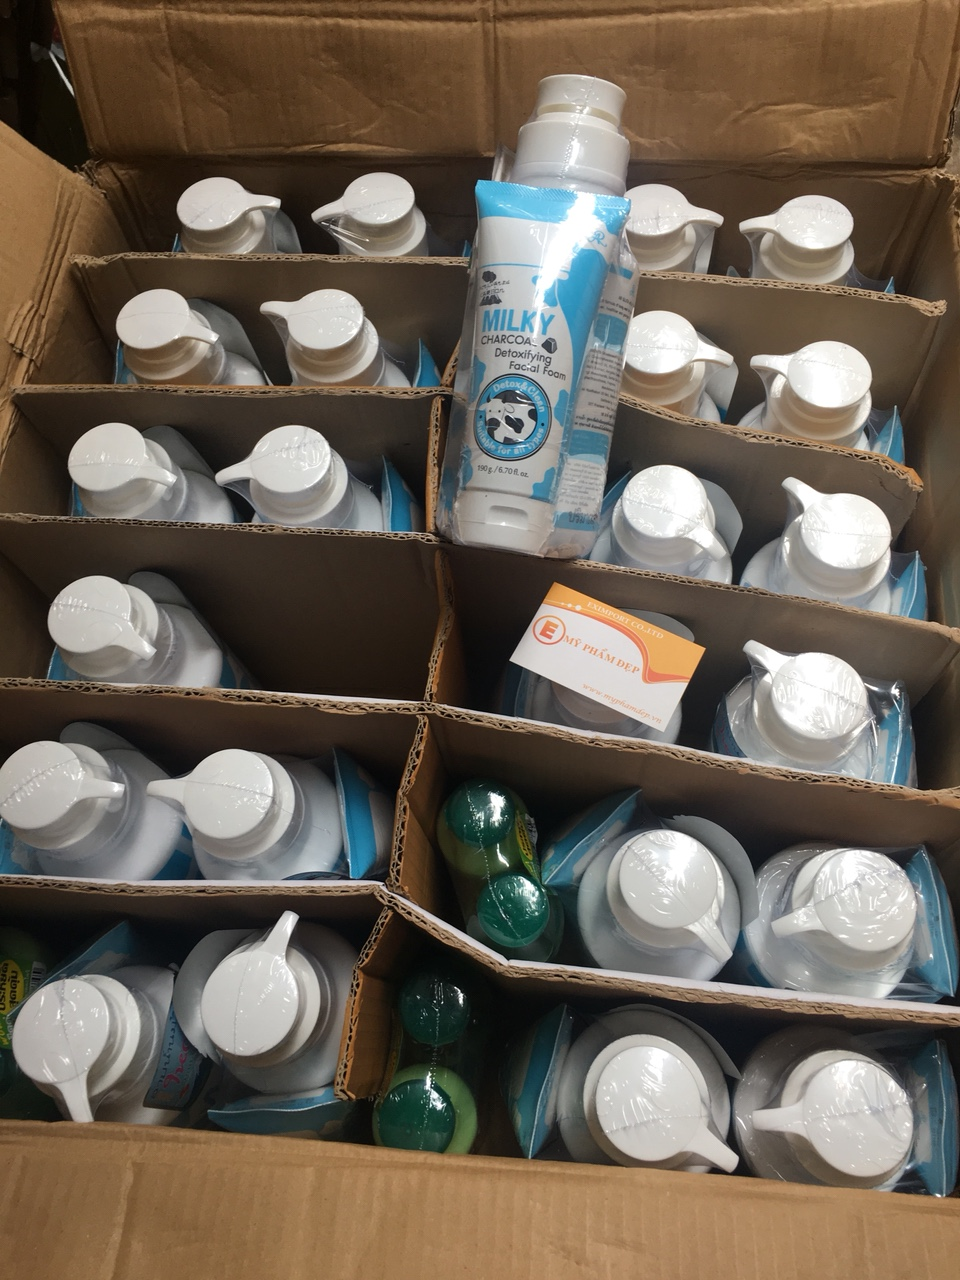 sua-rua-mat-sua-tam-gluta-milk-800ml-tang-kem-sua-rua-mat-gluta-milk-190g-thai-lan-2416